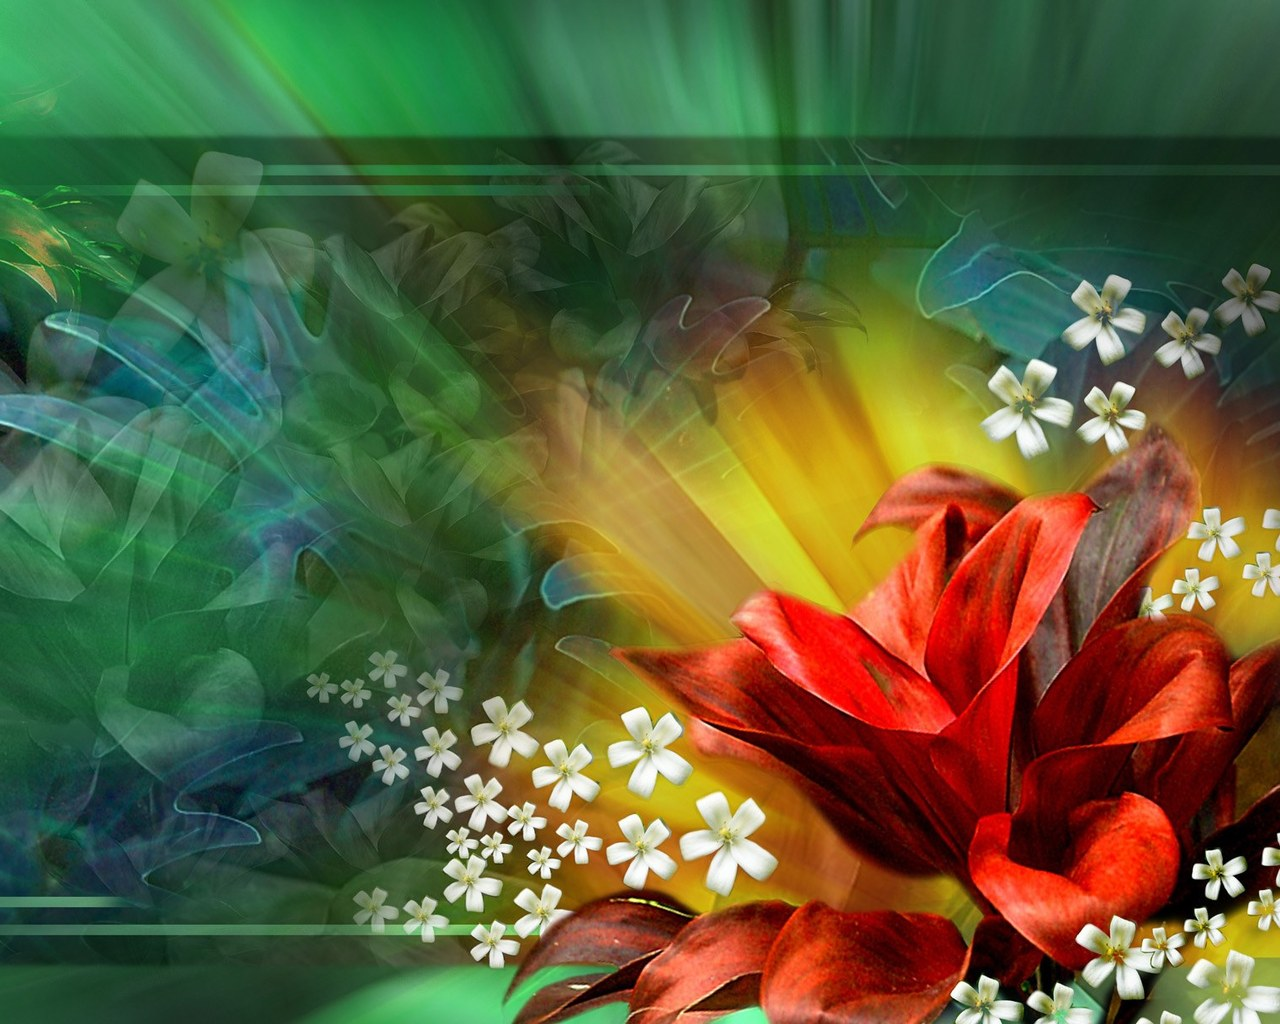 desktop backgrounds wallpaper pc 3d graphics cherry 3d wallpaper 1280x1024